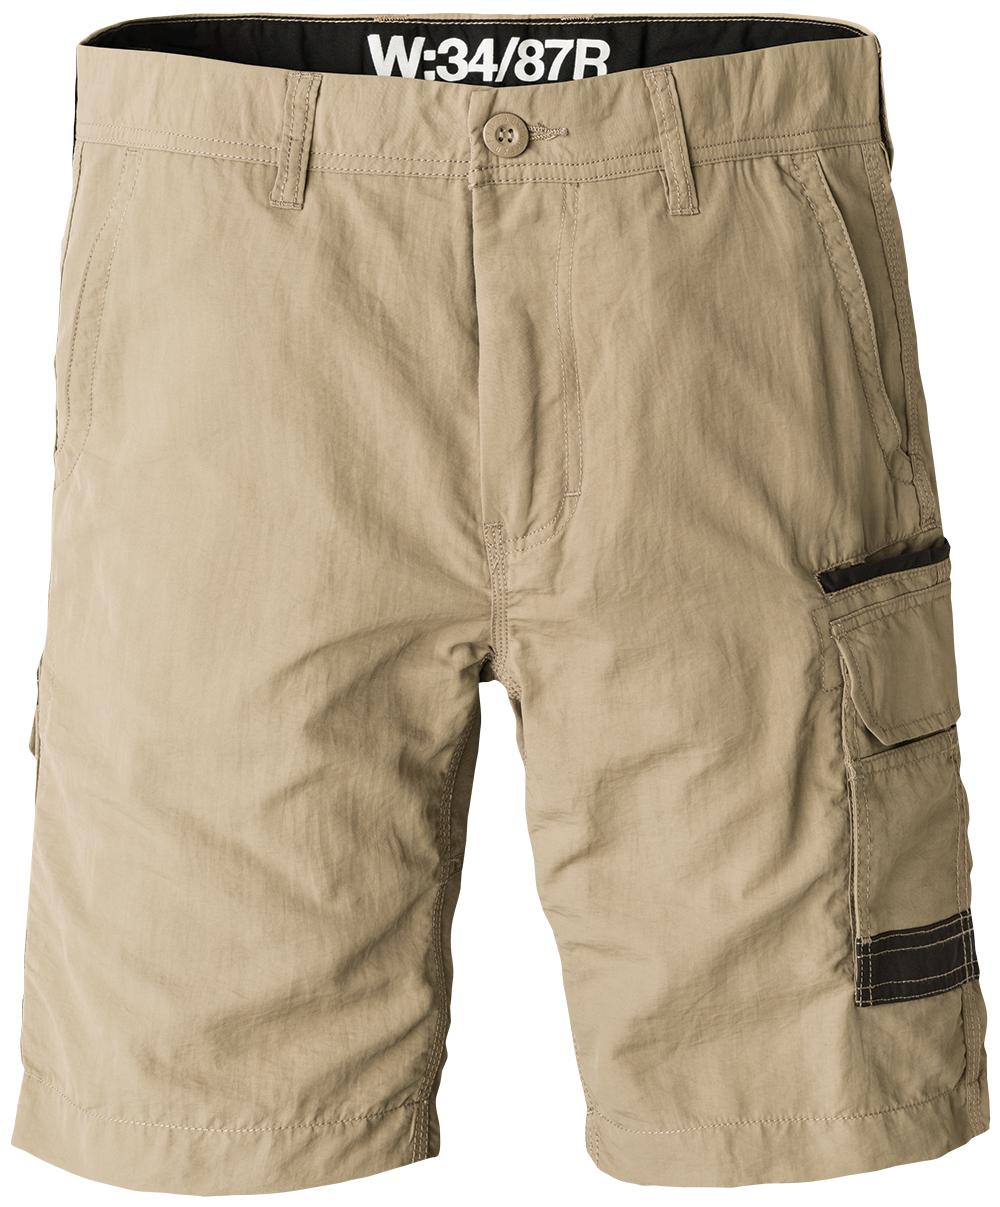 FXD Workwear LS-1 work shorts khaki